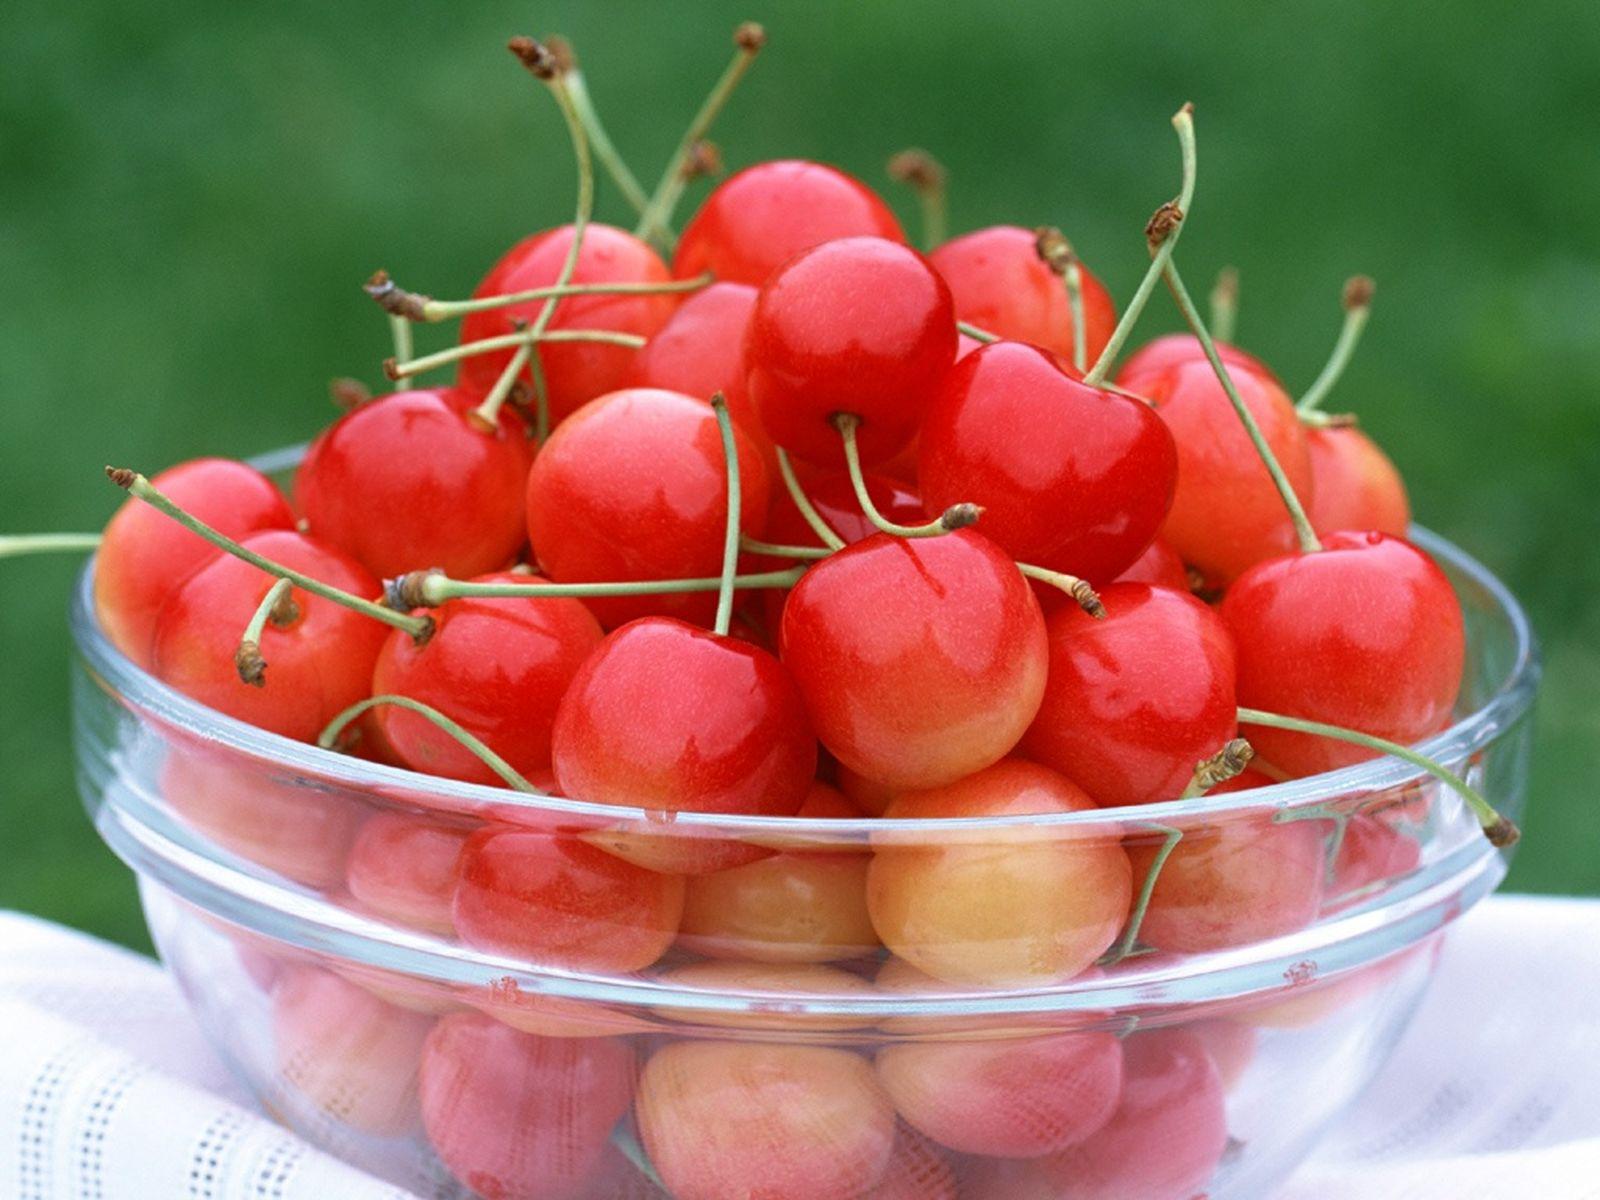 http://1.bp.blogspot.com/-ZE5PKKBDRzw/T7j7XbfZj7I/AAAAAAAAJU8/qo88AJ5pvvQ/s1600/Fruits_Wallpapers__02.jpg